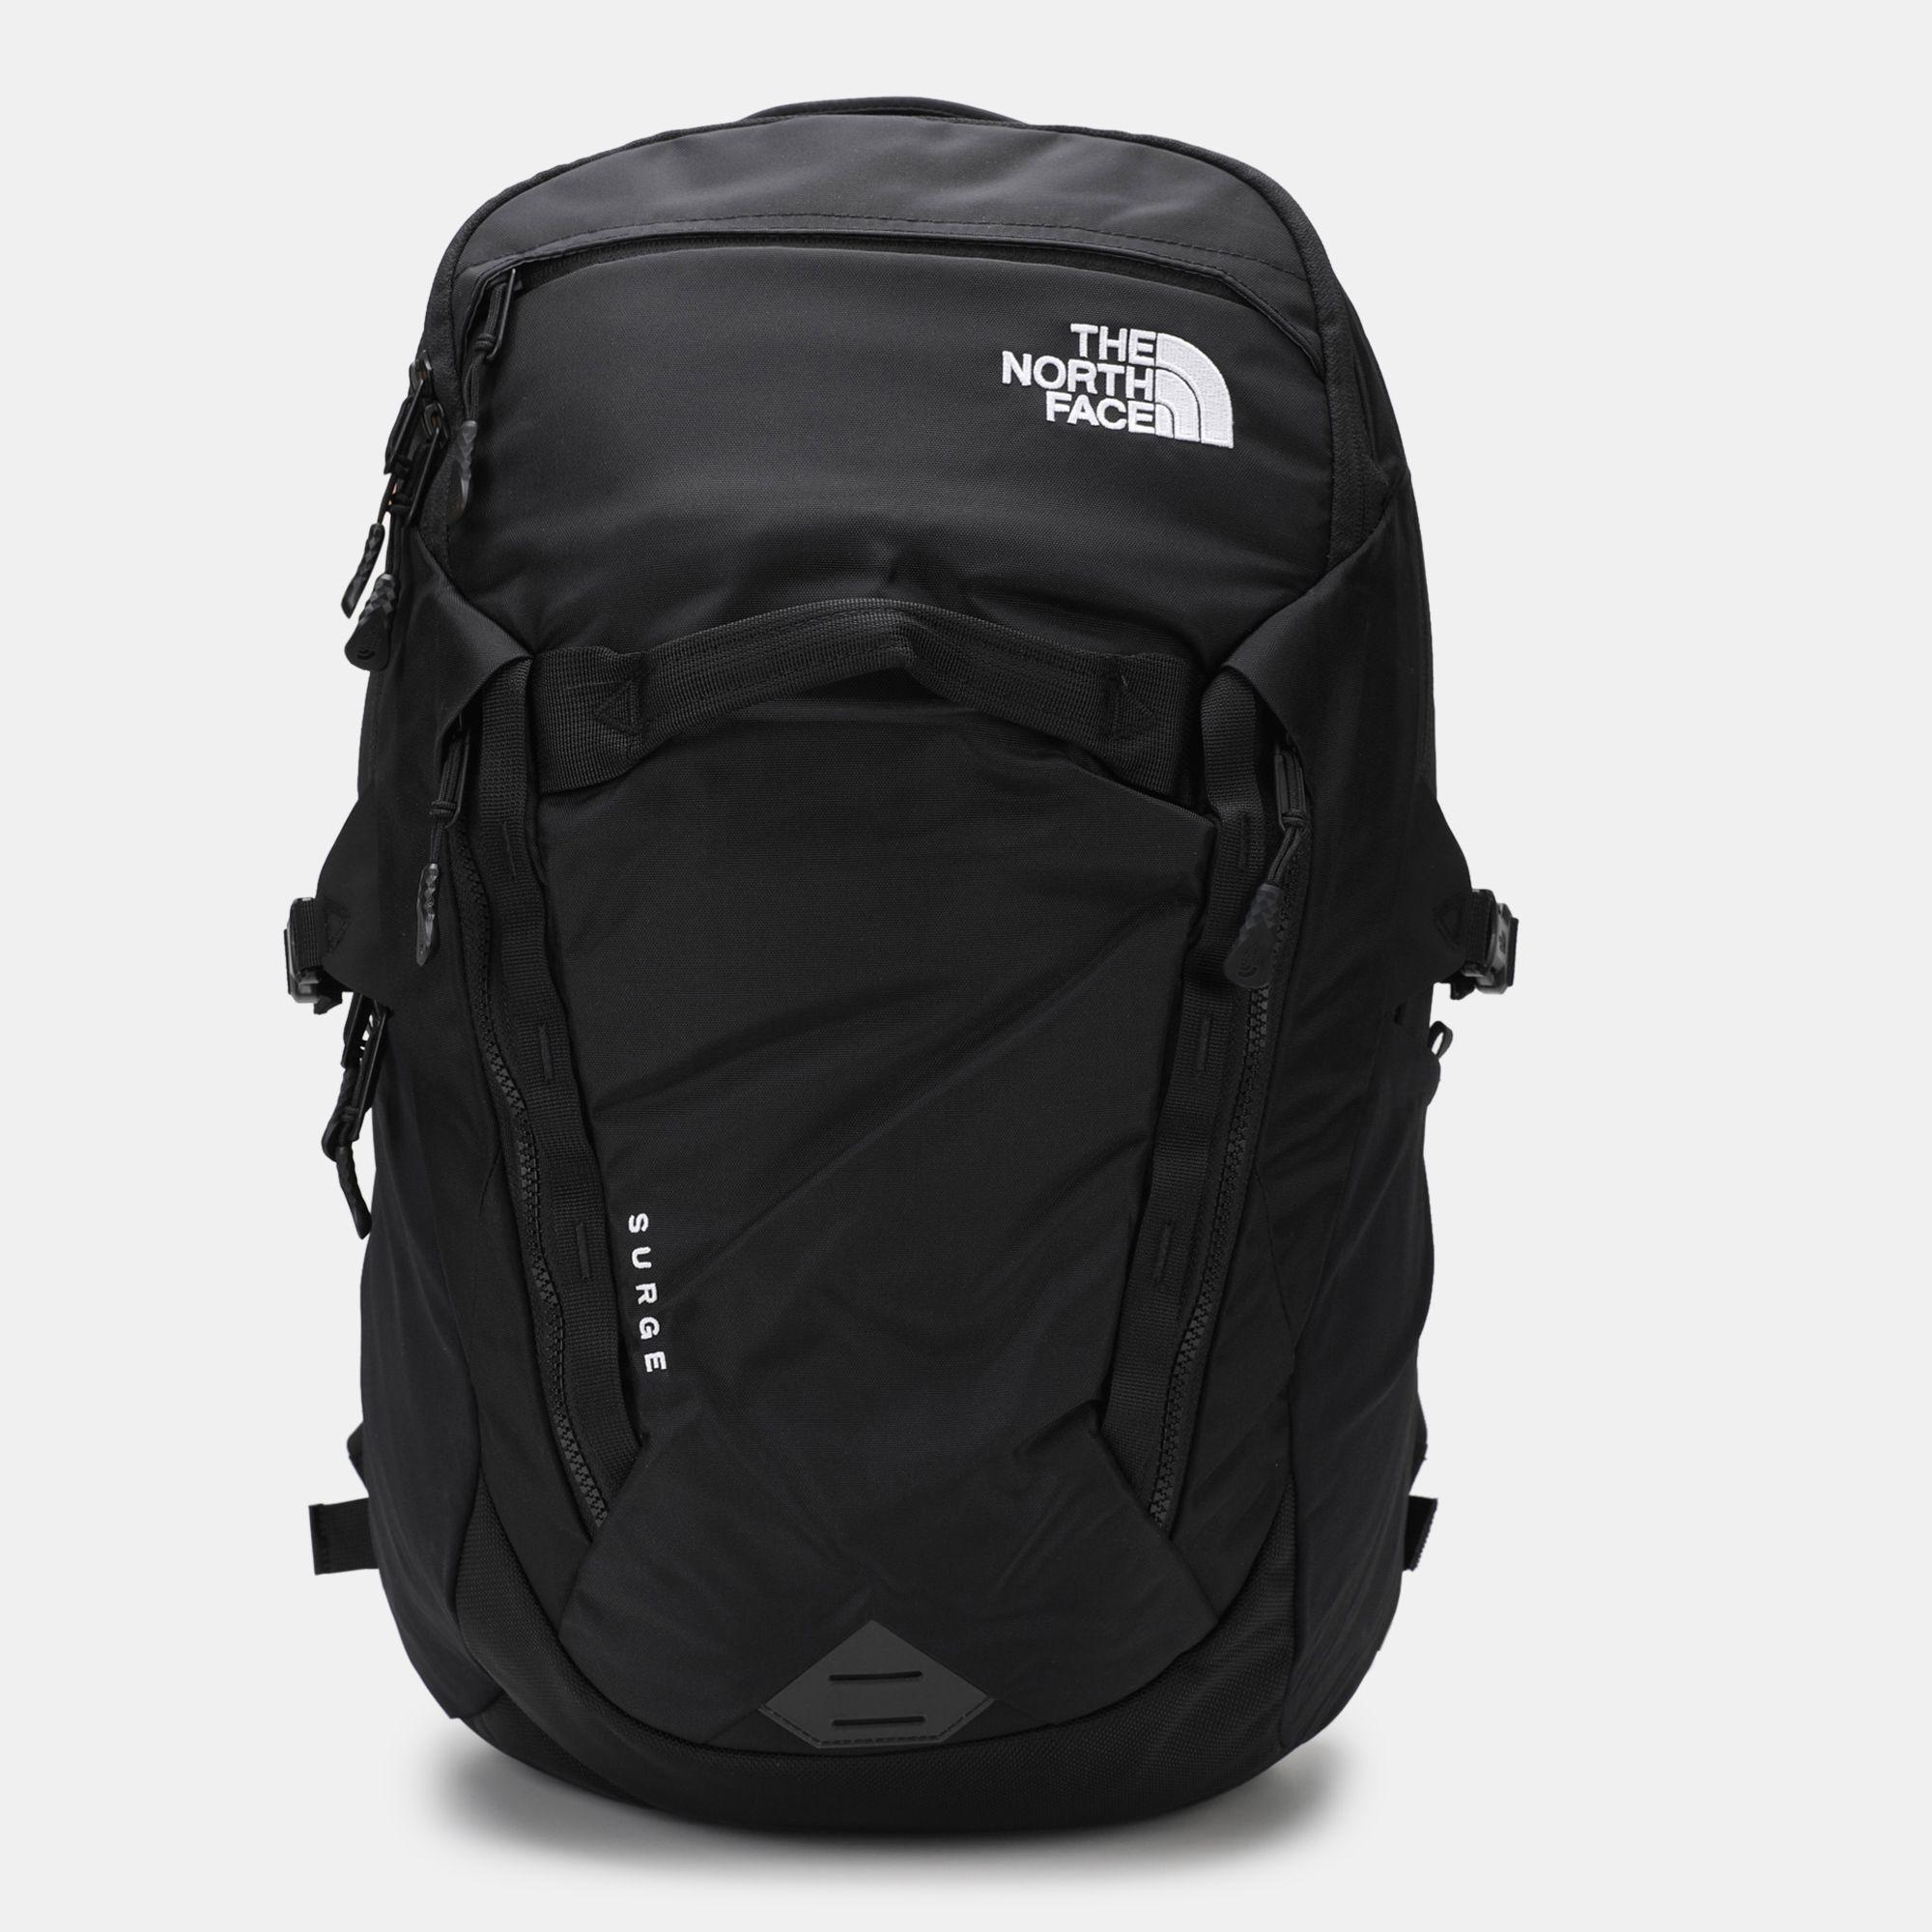 8eca94bd782c Shop Black The North Face Surge 32L Backpack | Backpacks and ...